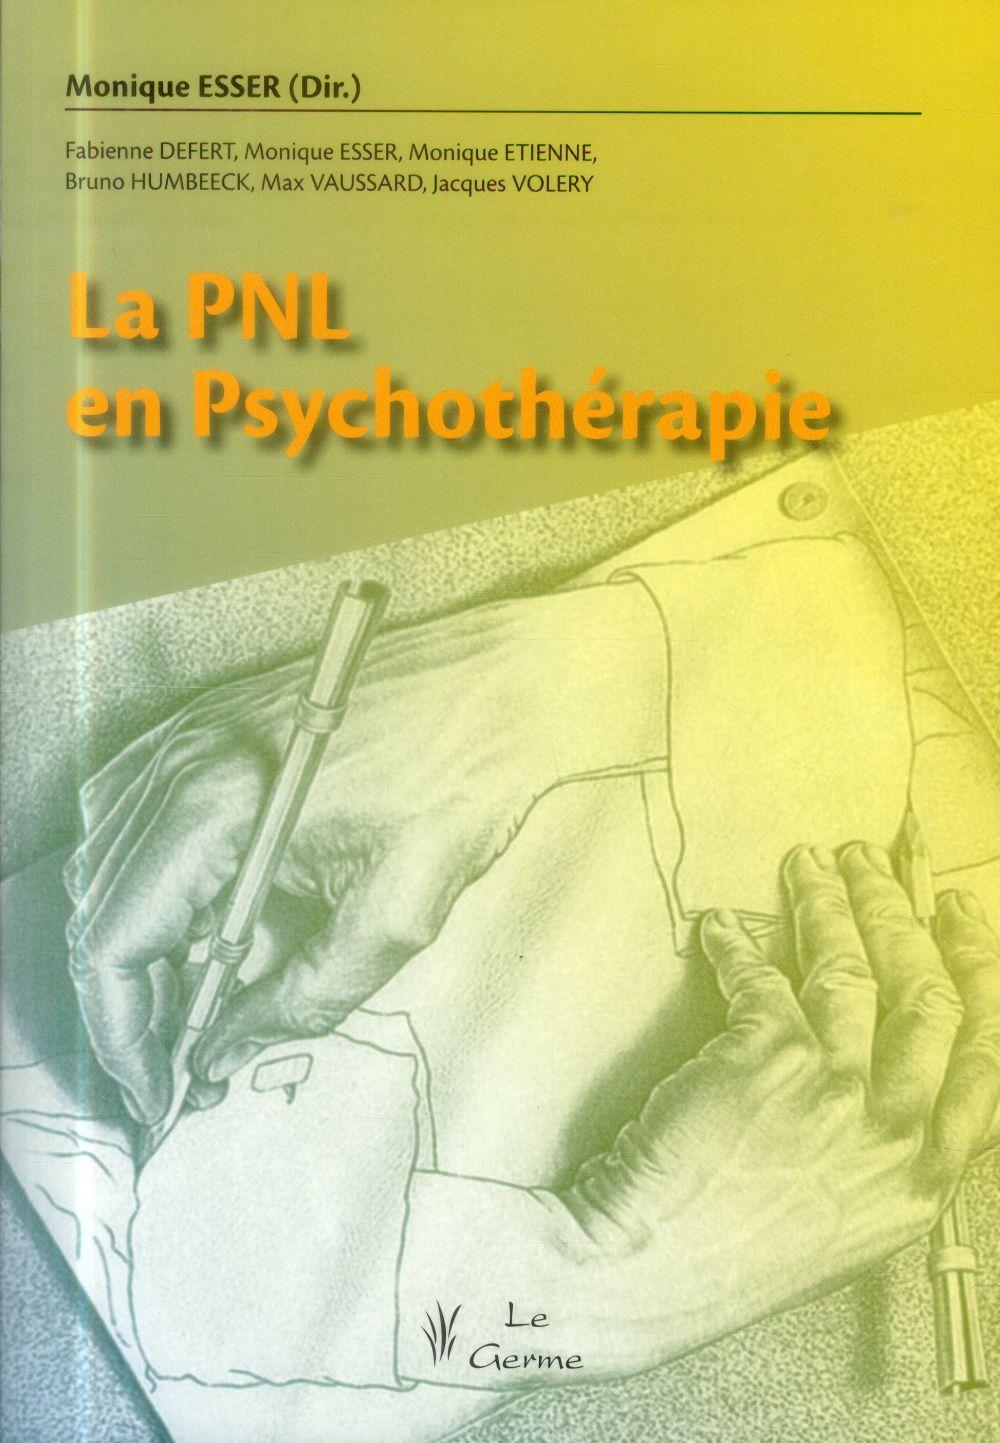 La PLN en psychotherapie